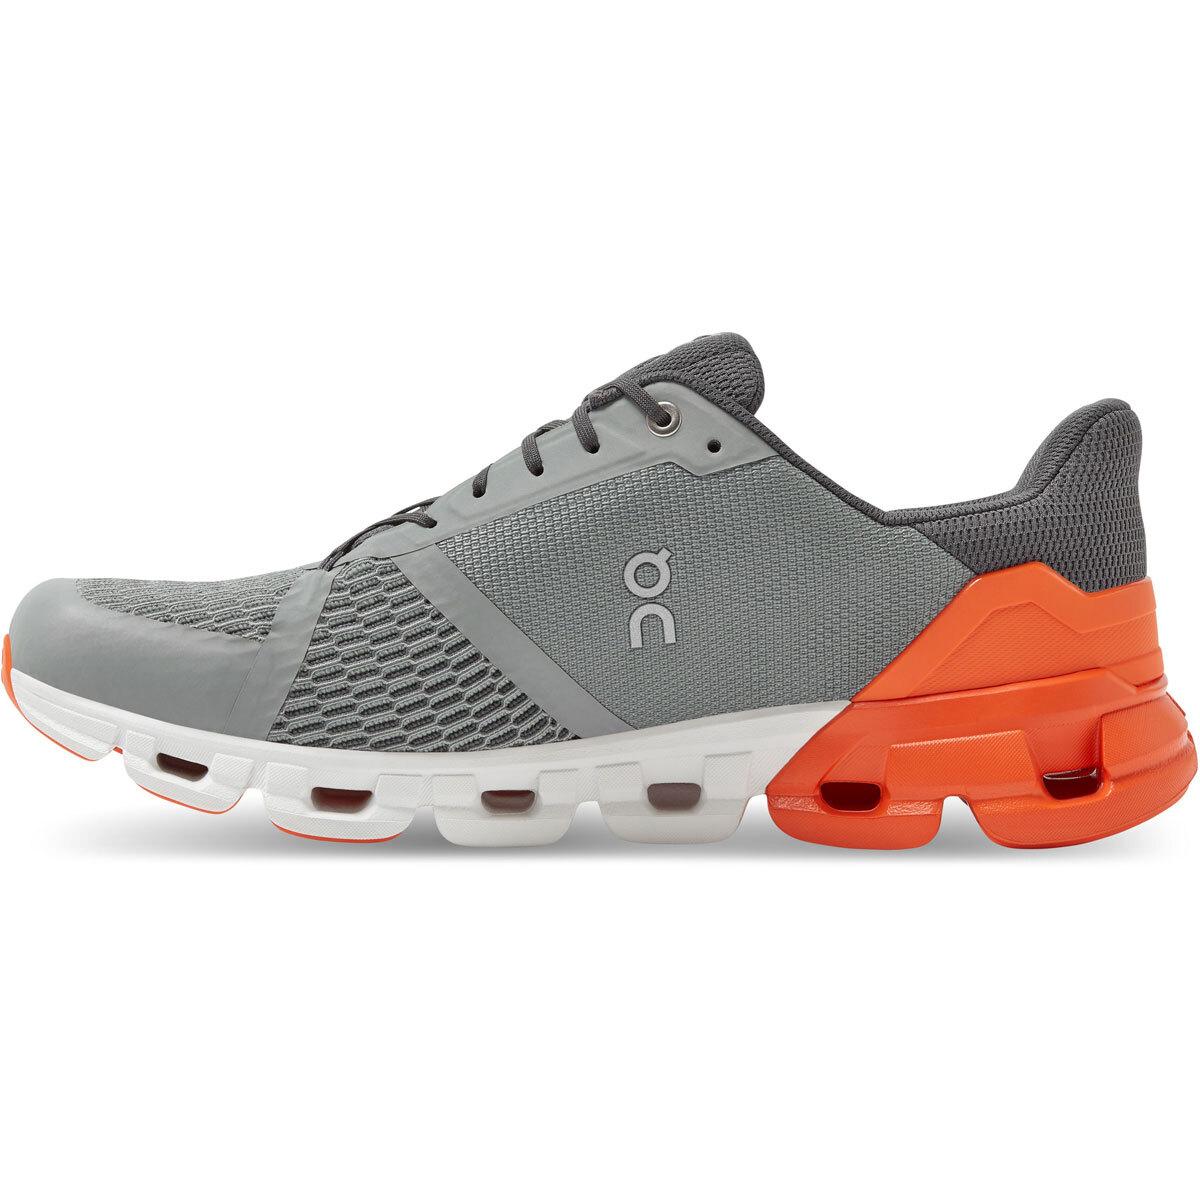 Men's On Cloudflyer 2.0 Running Shoe - Color: Grey/Orange - Size: 9 - Width: Regular, Grey/Orange, large, image 3